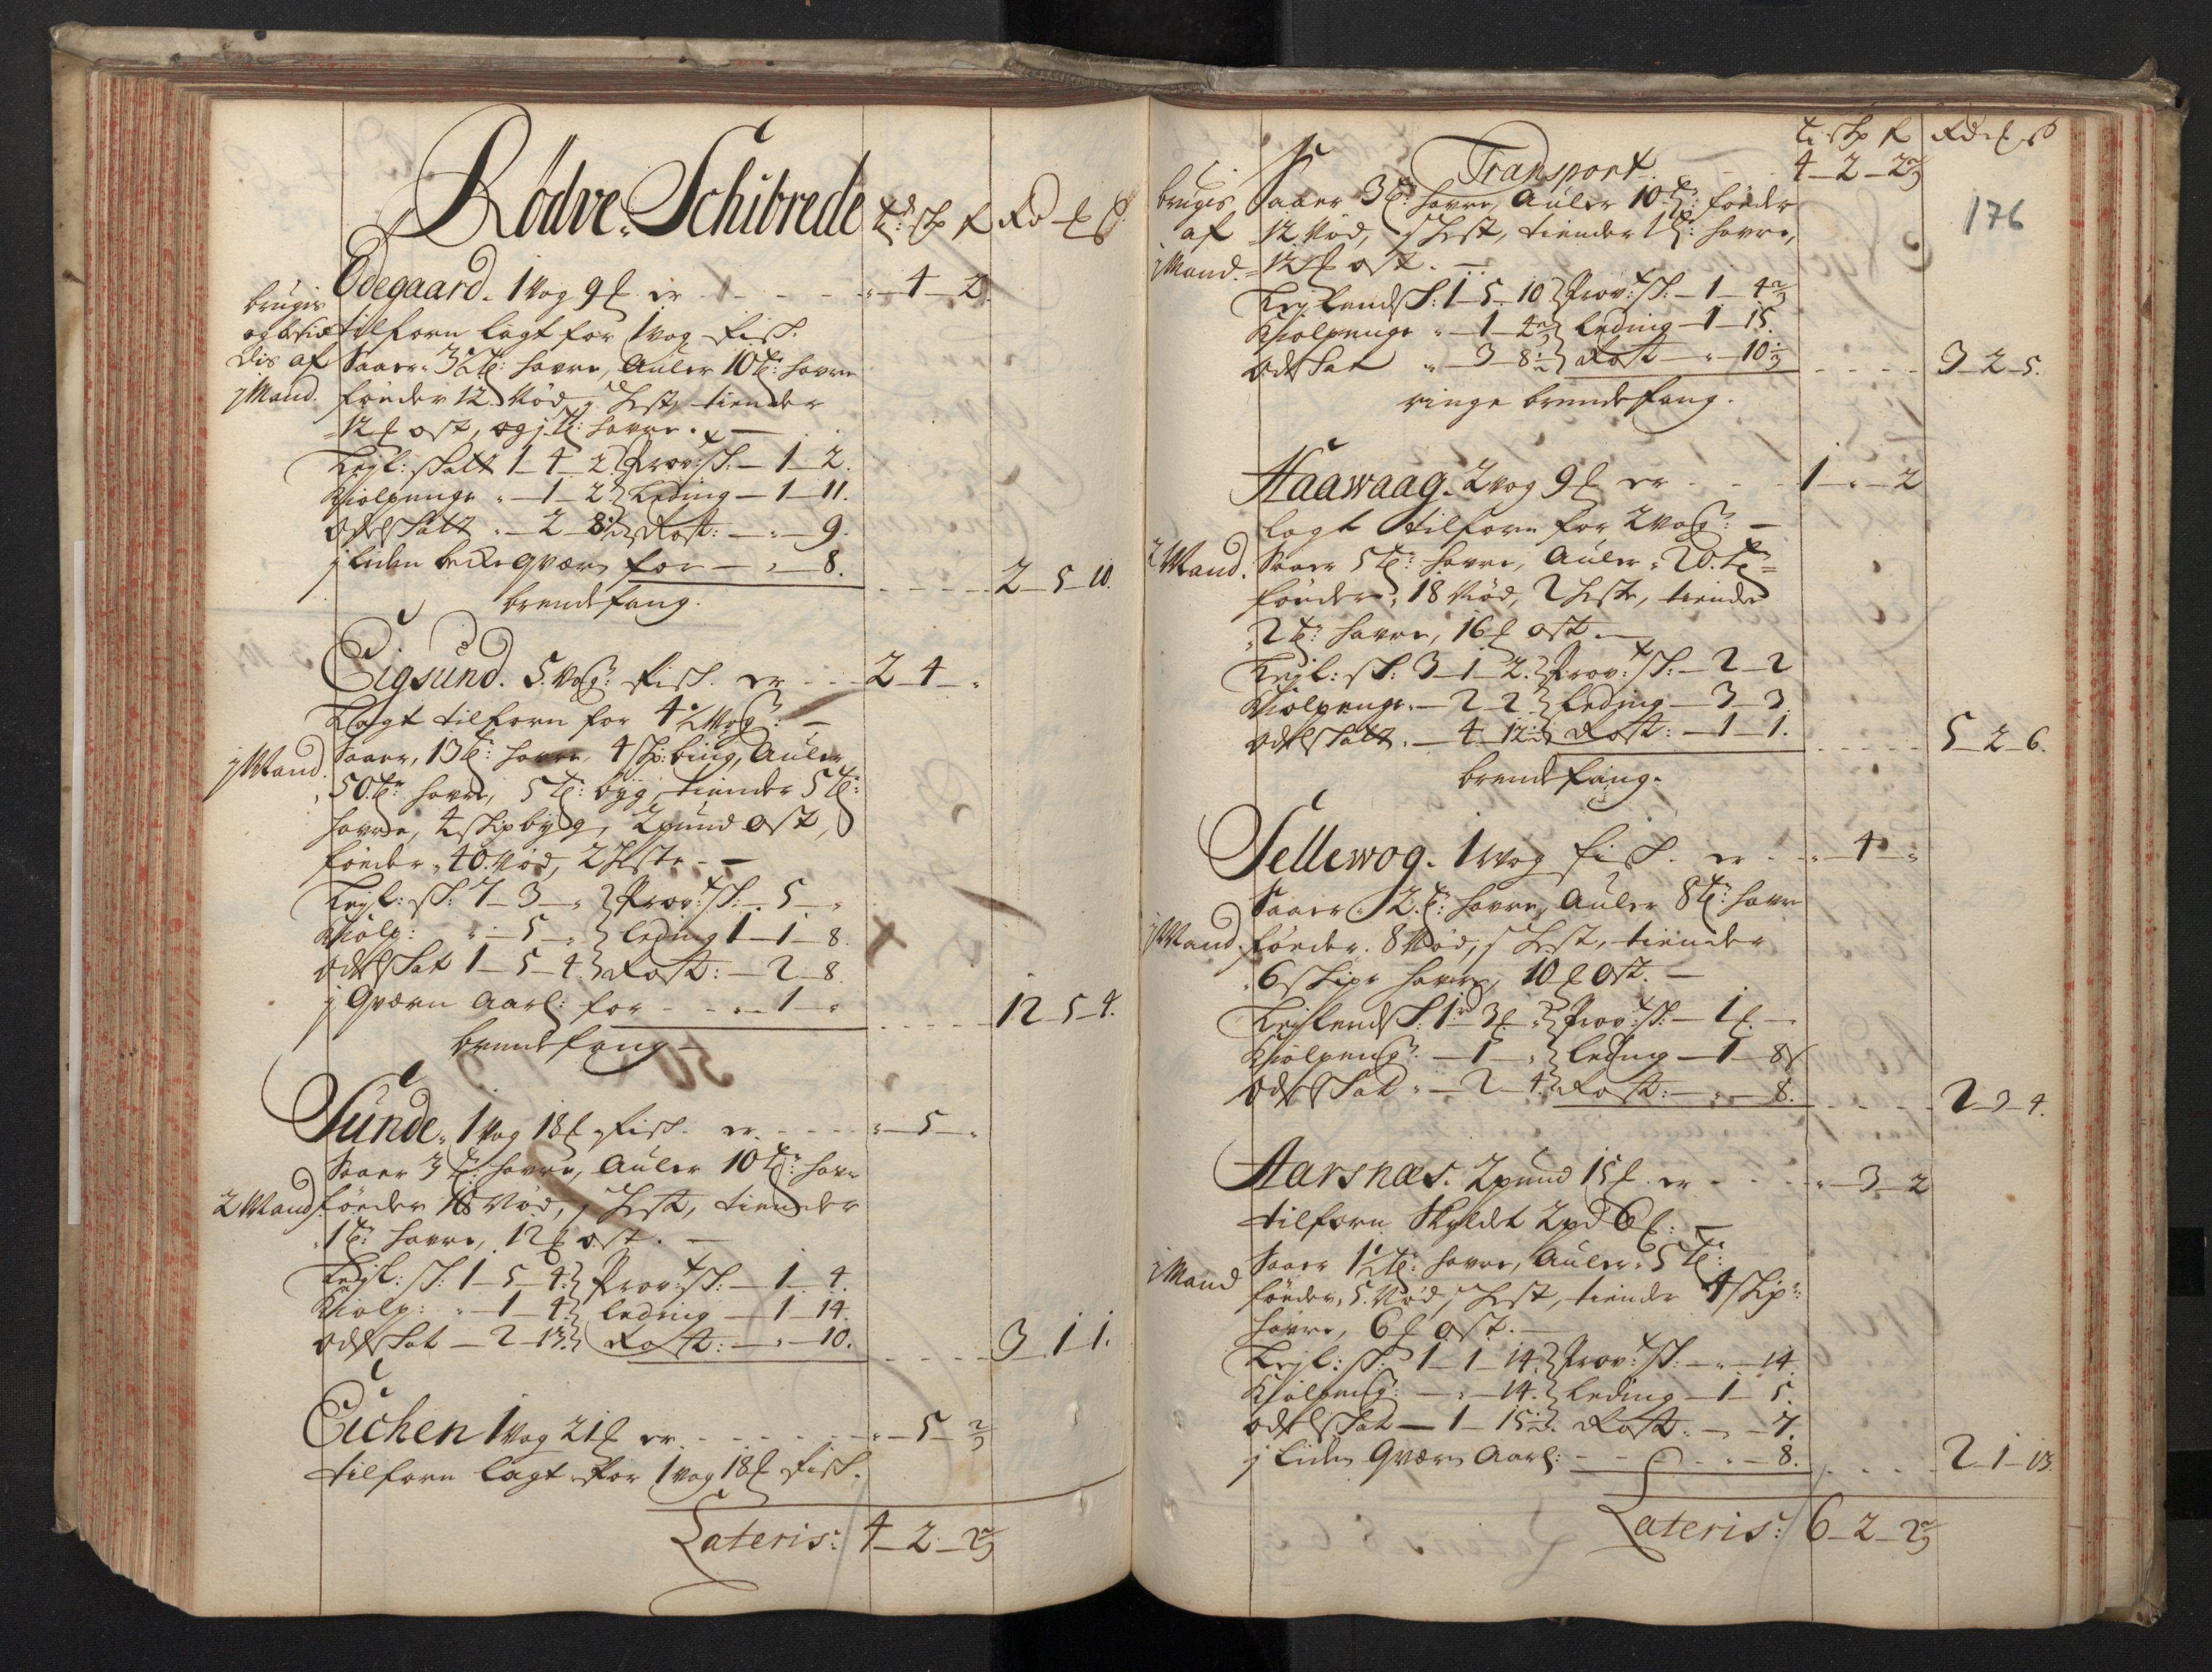 RA, Rentekammeret inntil 1814, Realistisk ordnet avdeling, N/Nb/Nbf/L0148: Sunnmøre, prøvematrikkel, 1714, s. 175b-176a